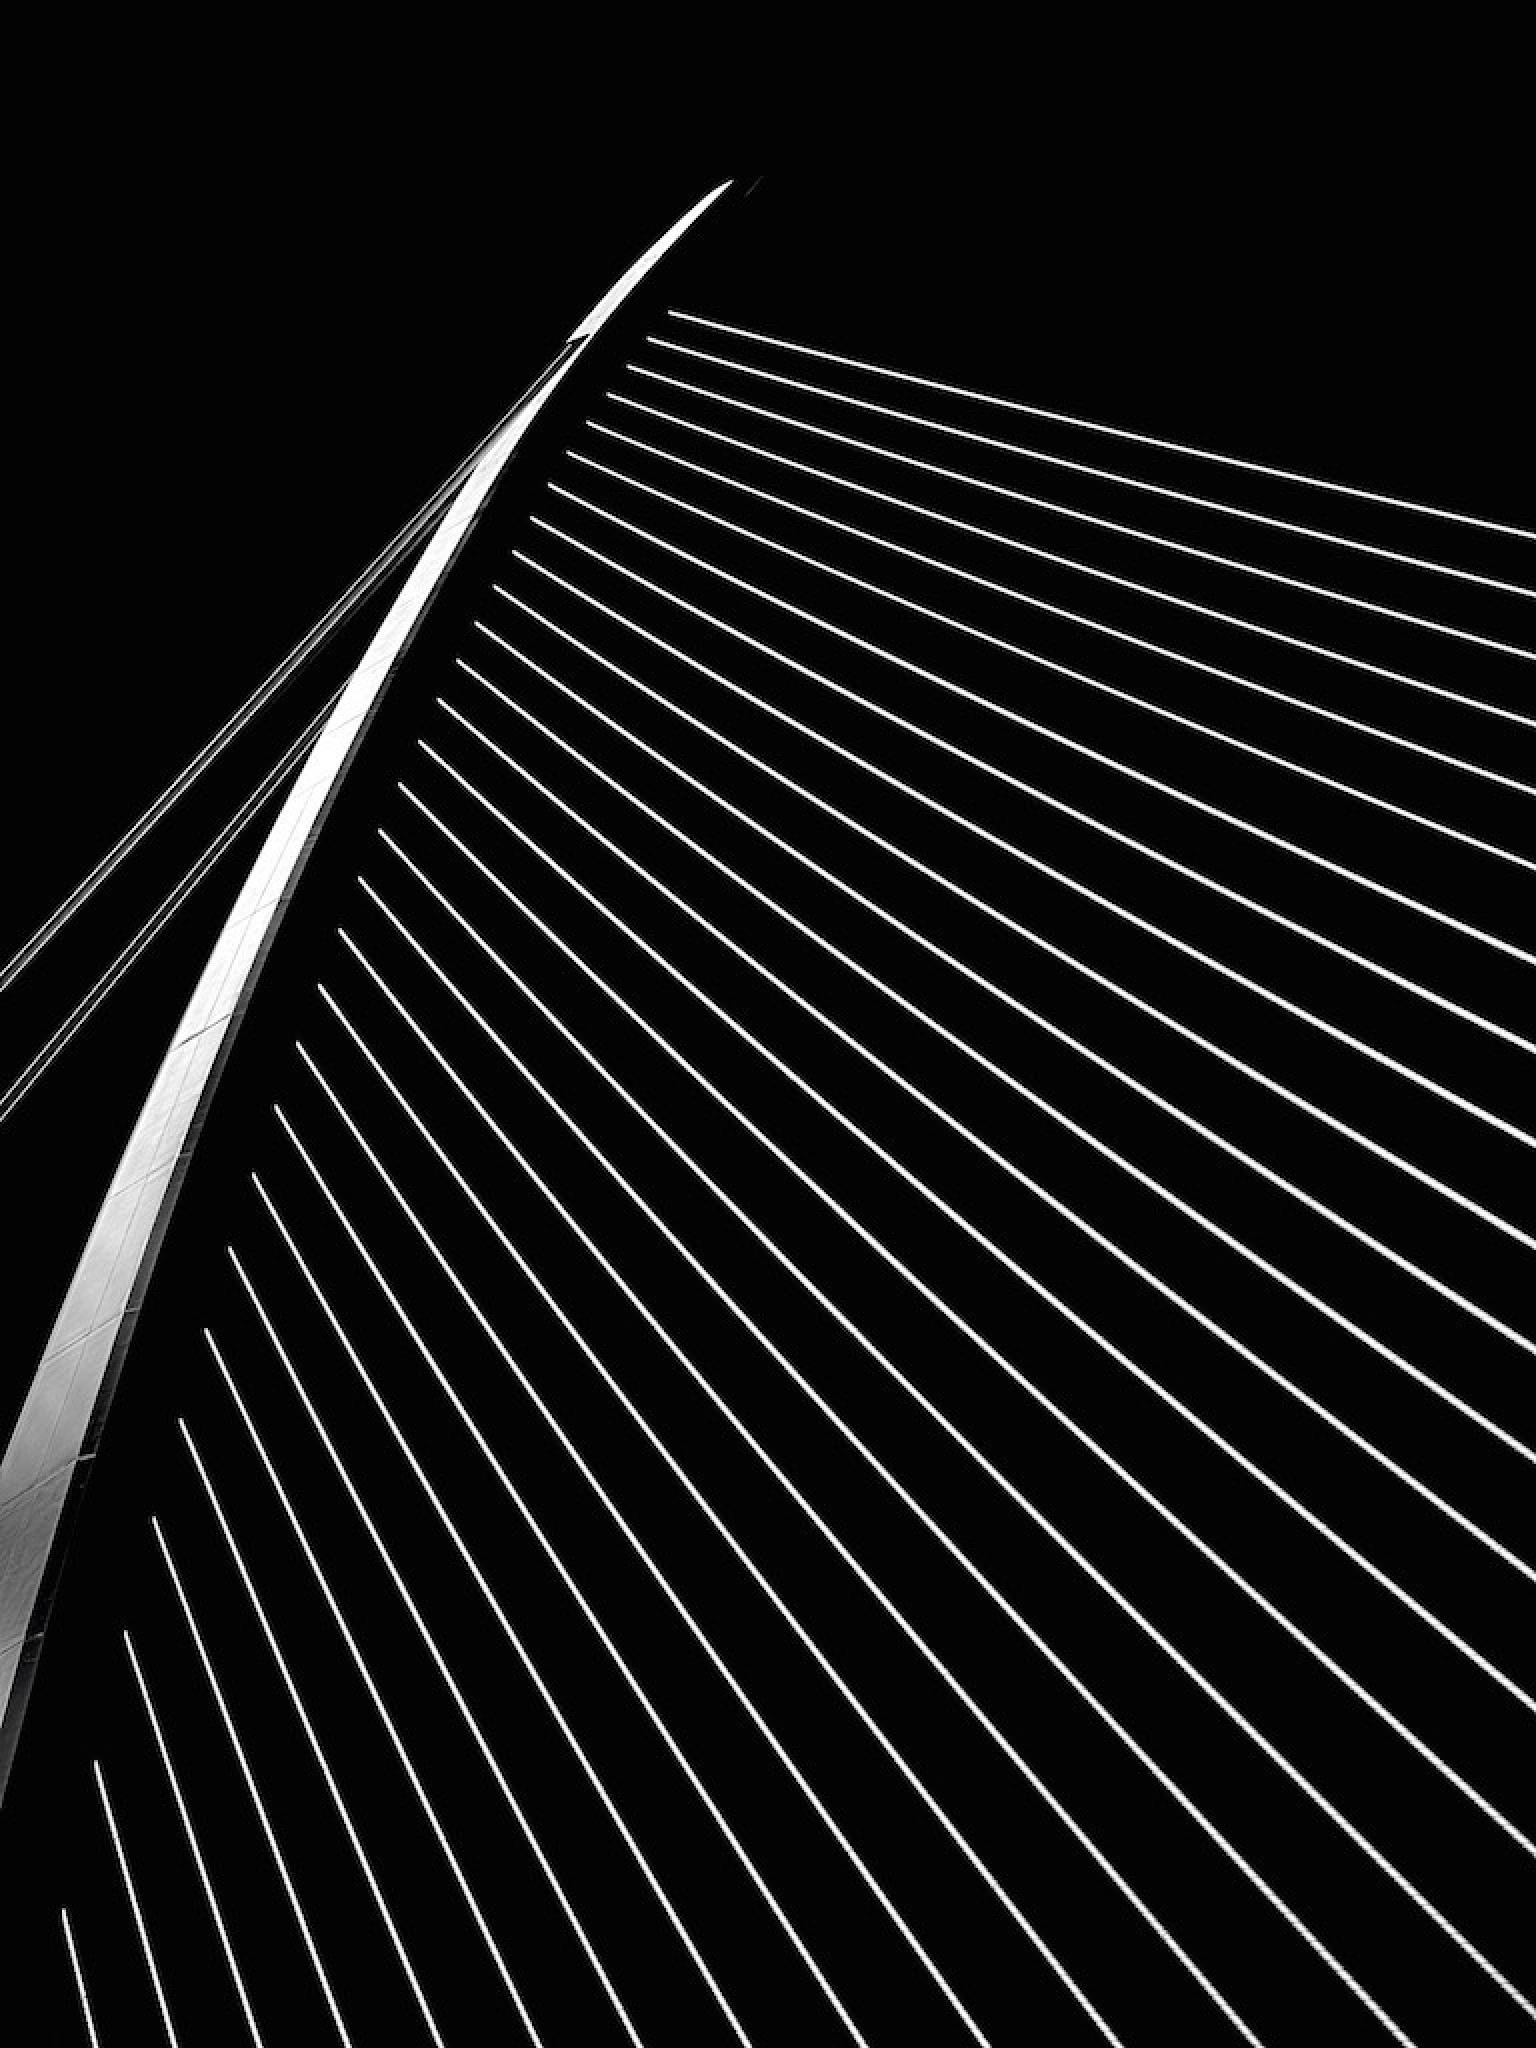 Calatrava Bridge by carlvanassche